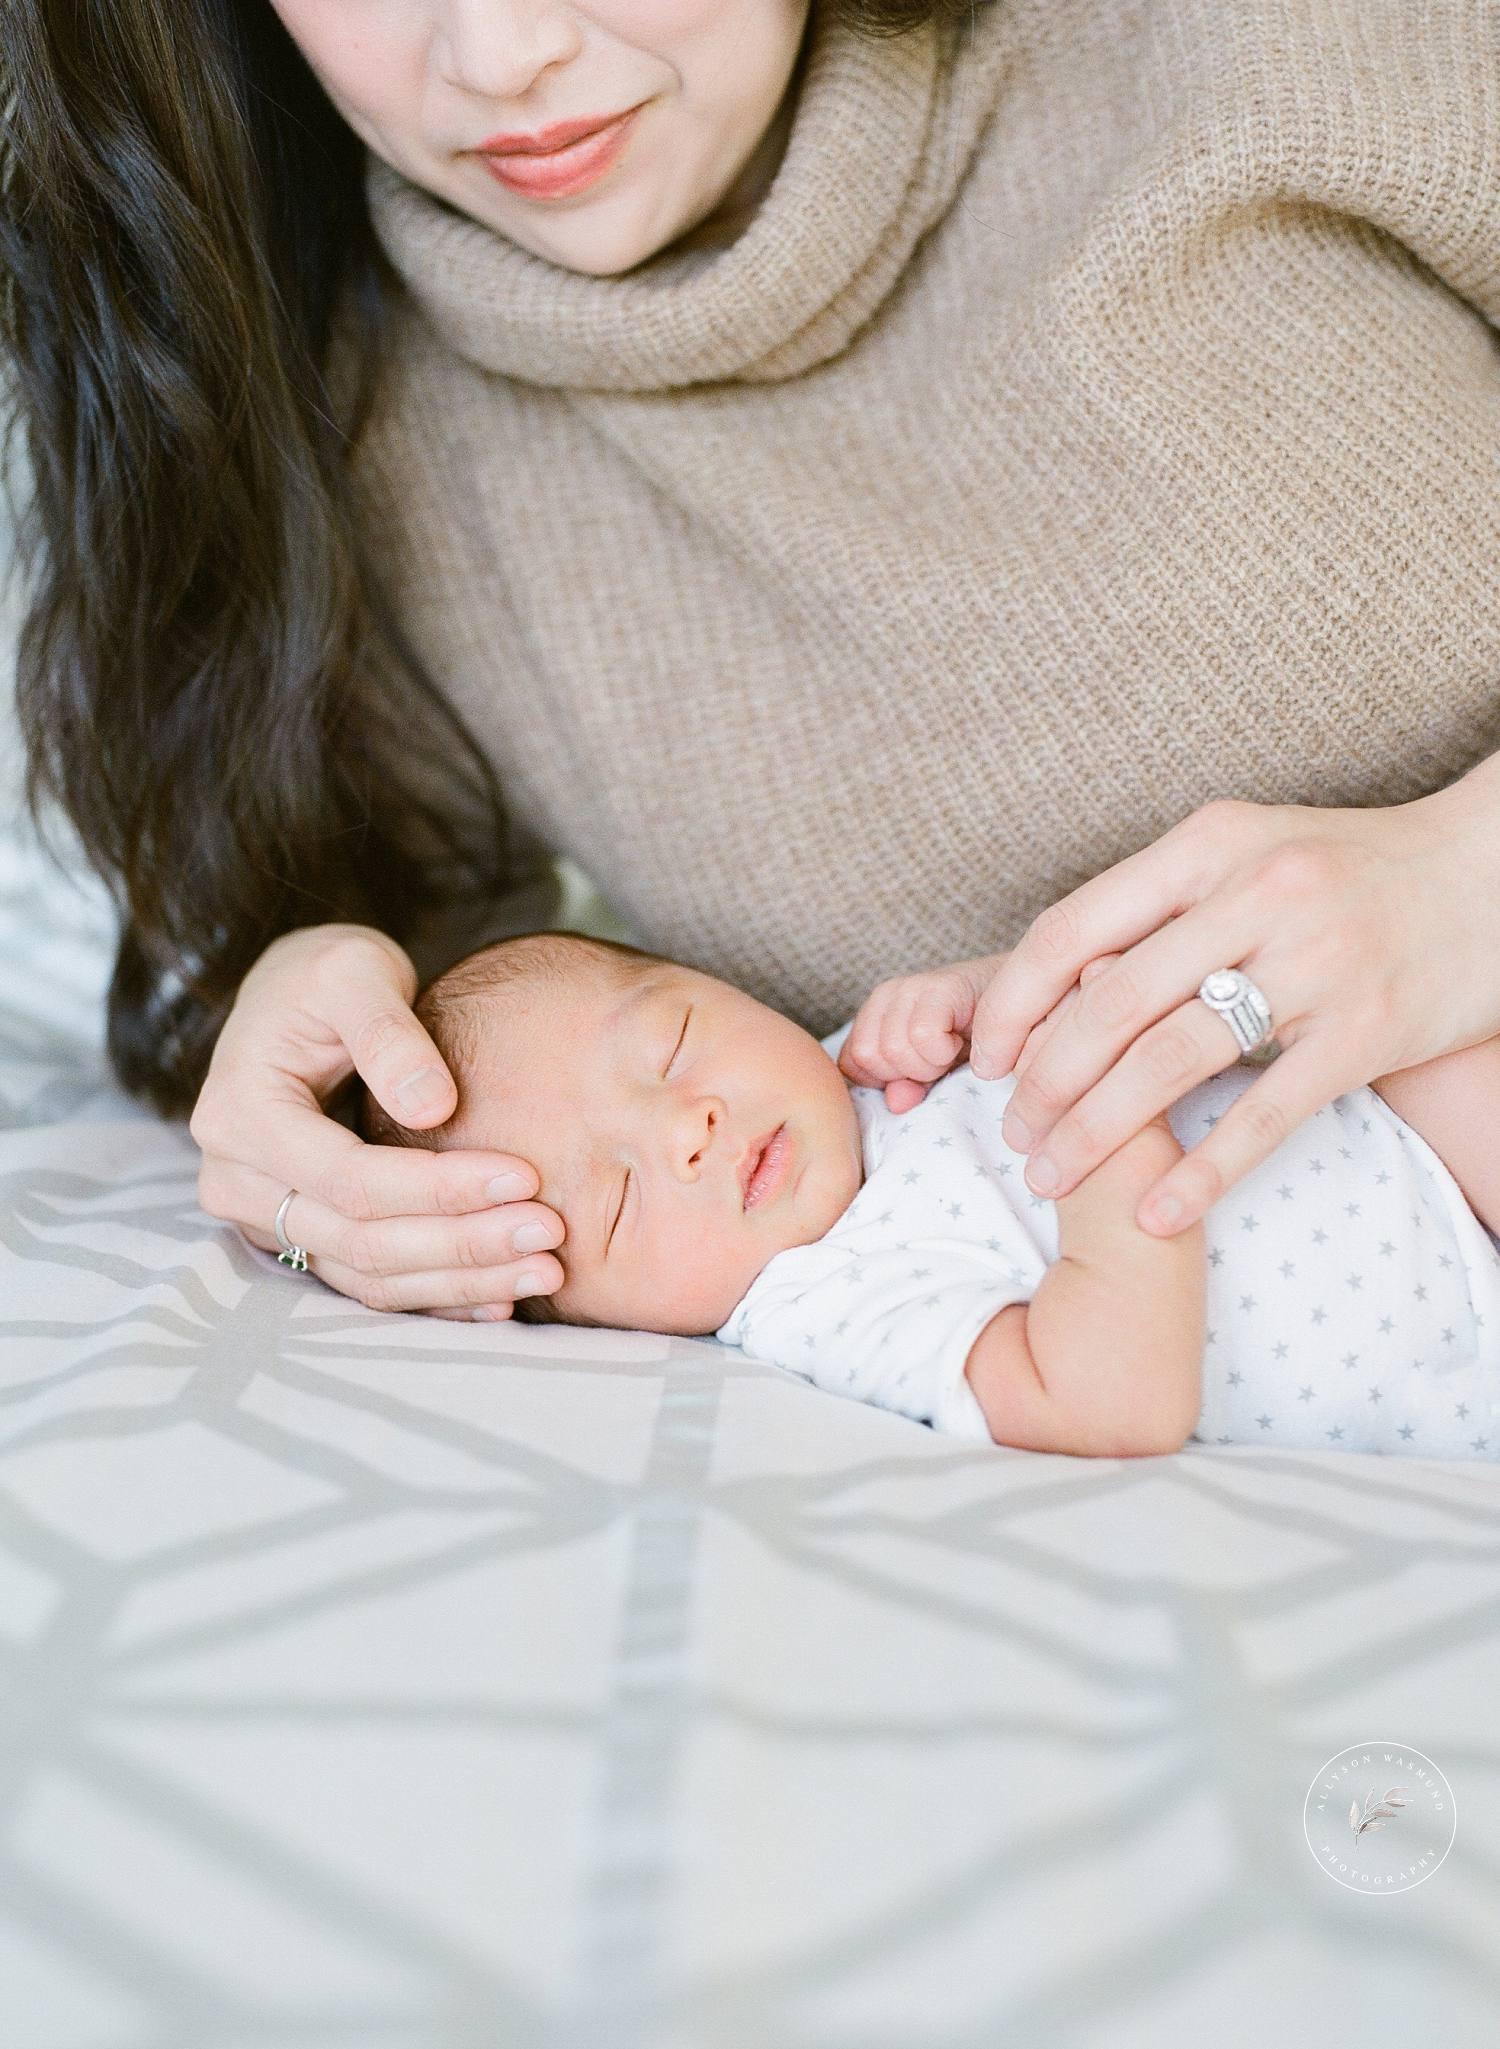 st-paul-mn-in-home-newborn-photographer-preston_0010.jpg